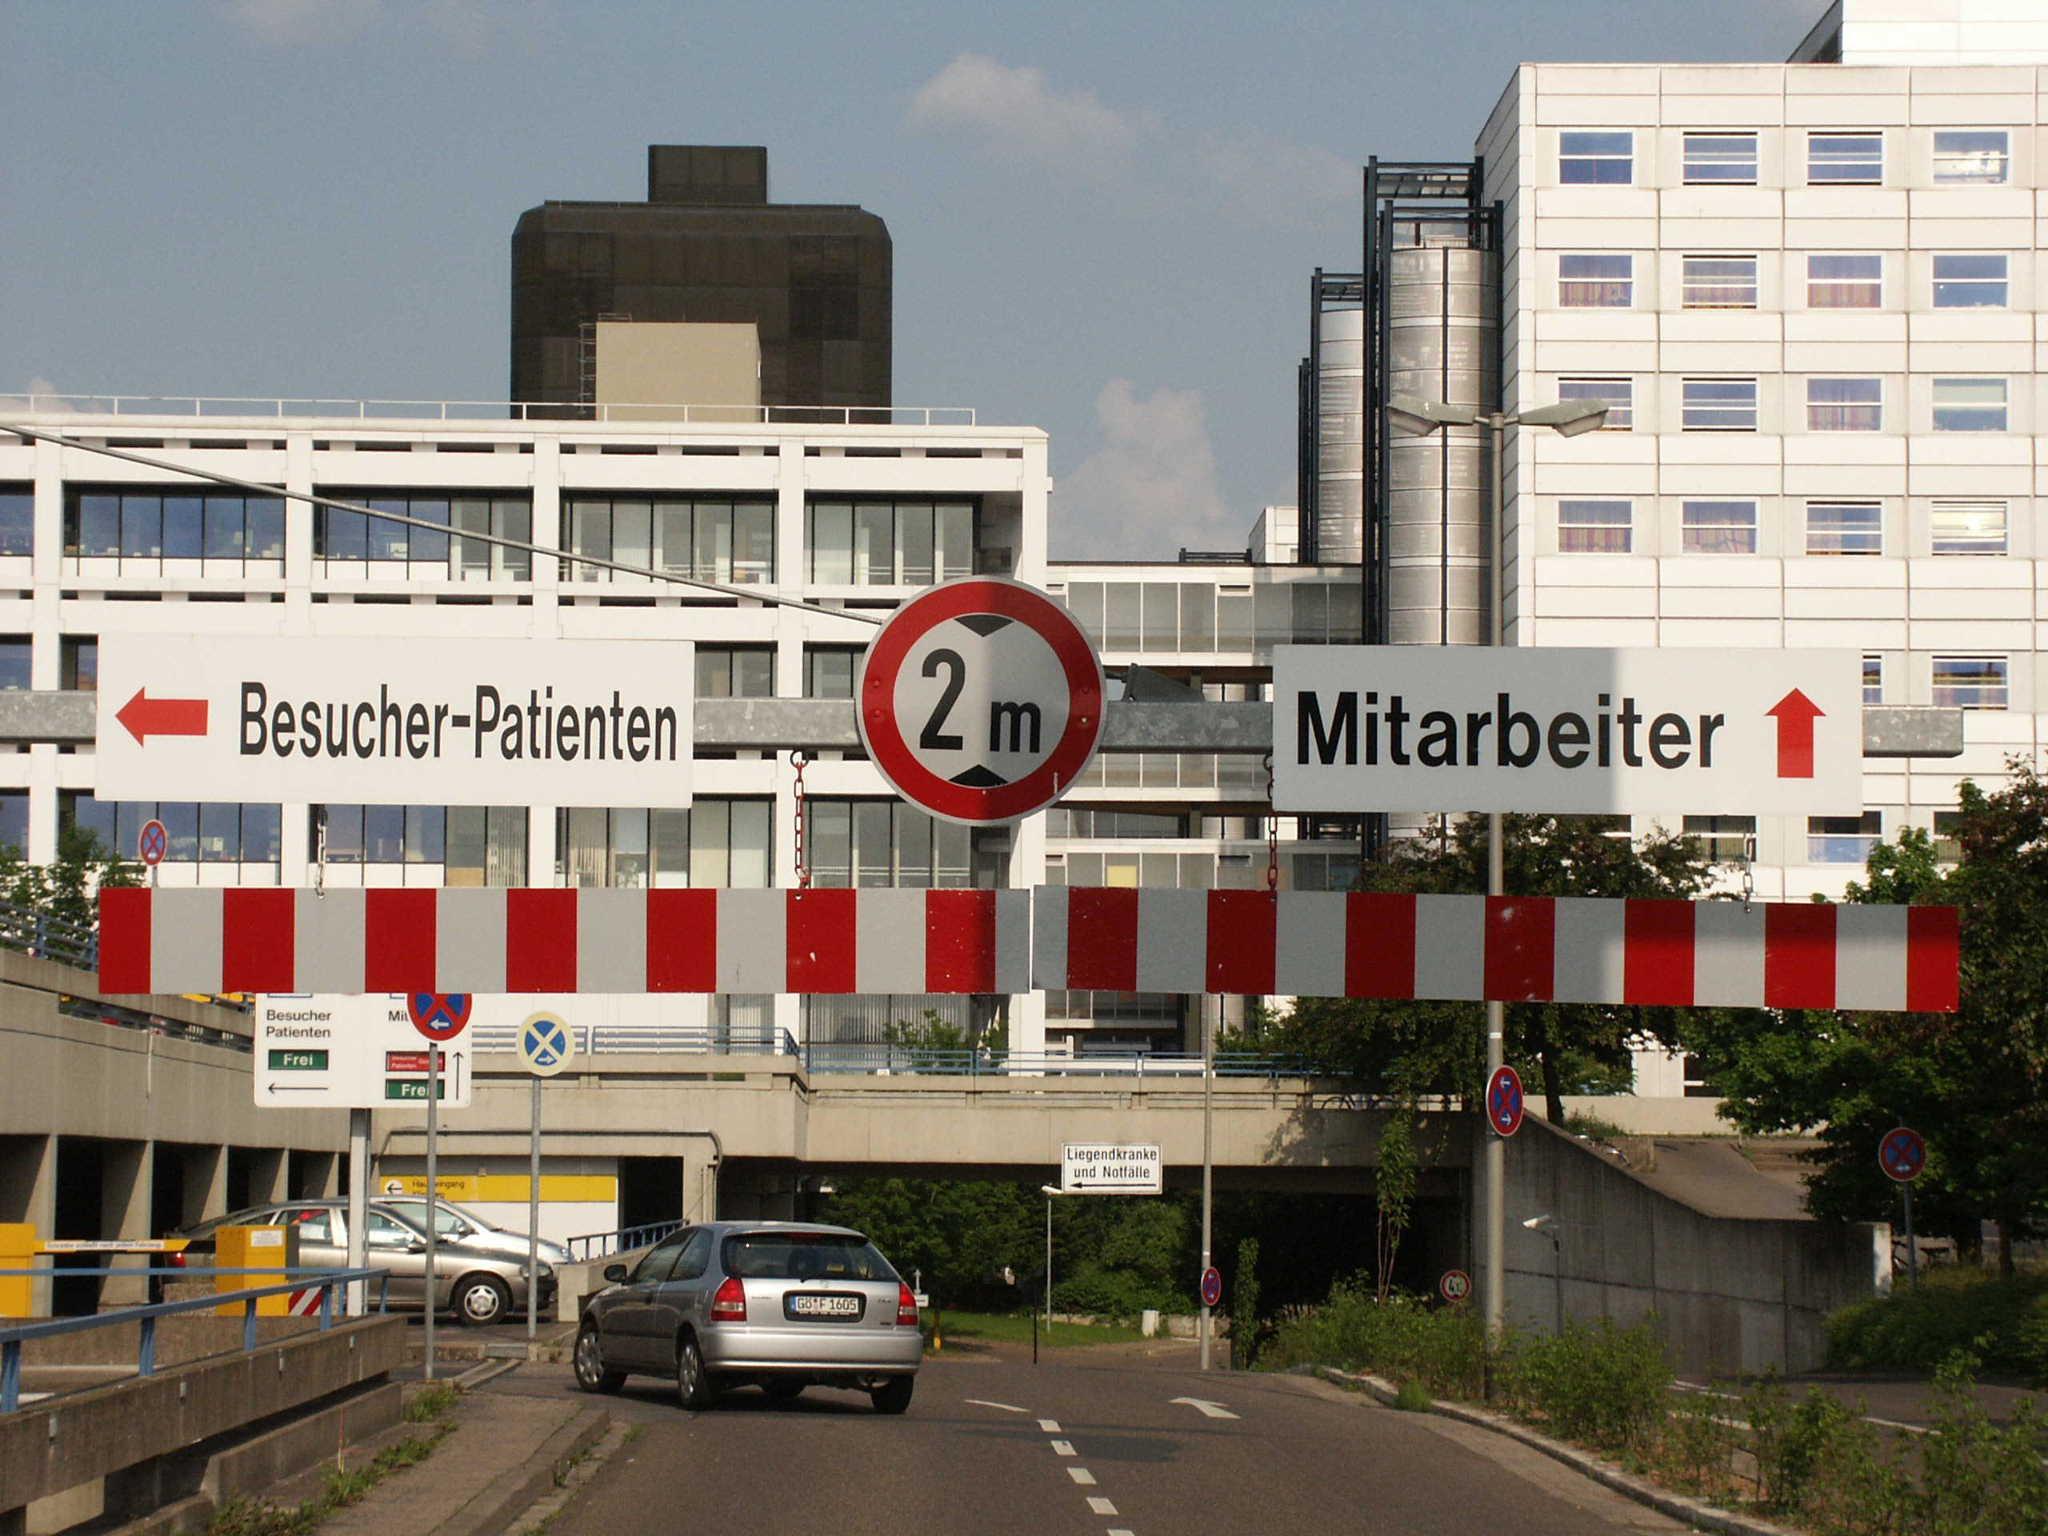 ➤ Universitätsmedizin Göttingen 37073 Göttingen Adresse